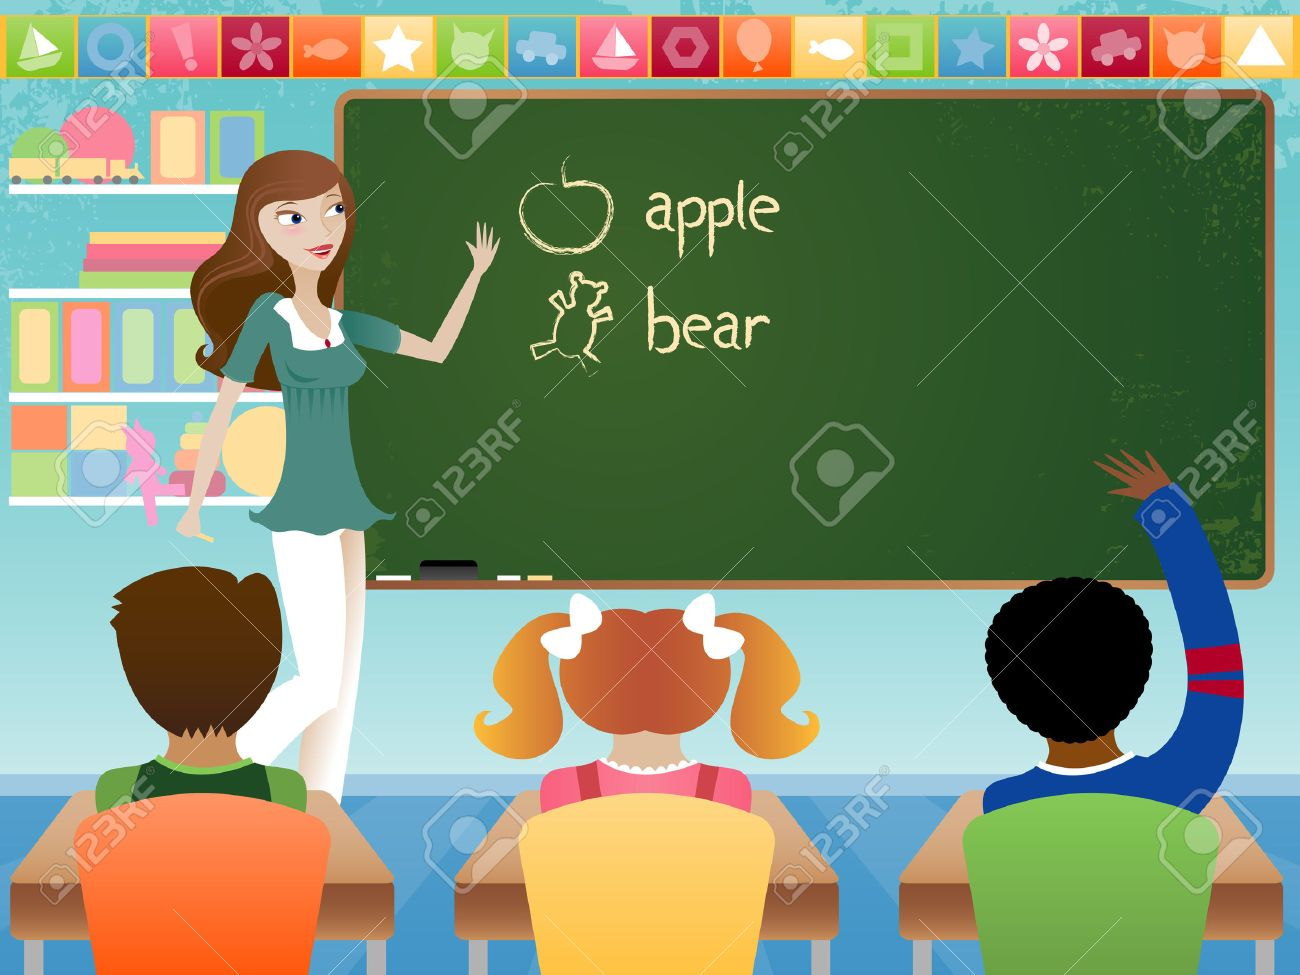 elementary school words